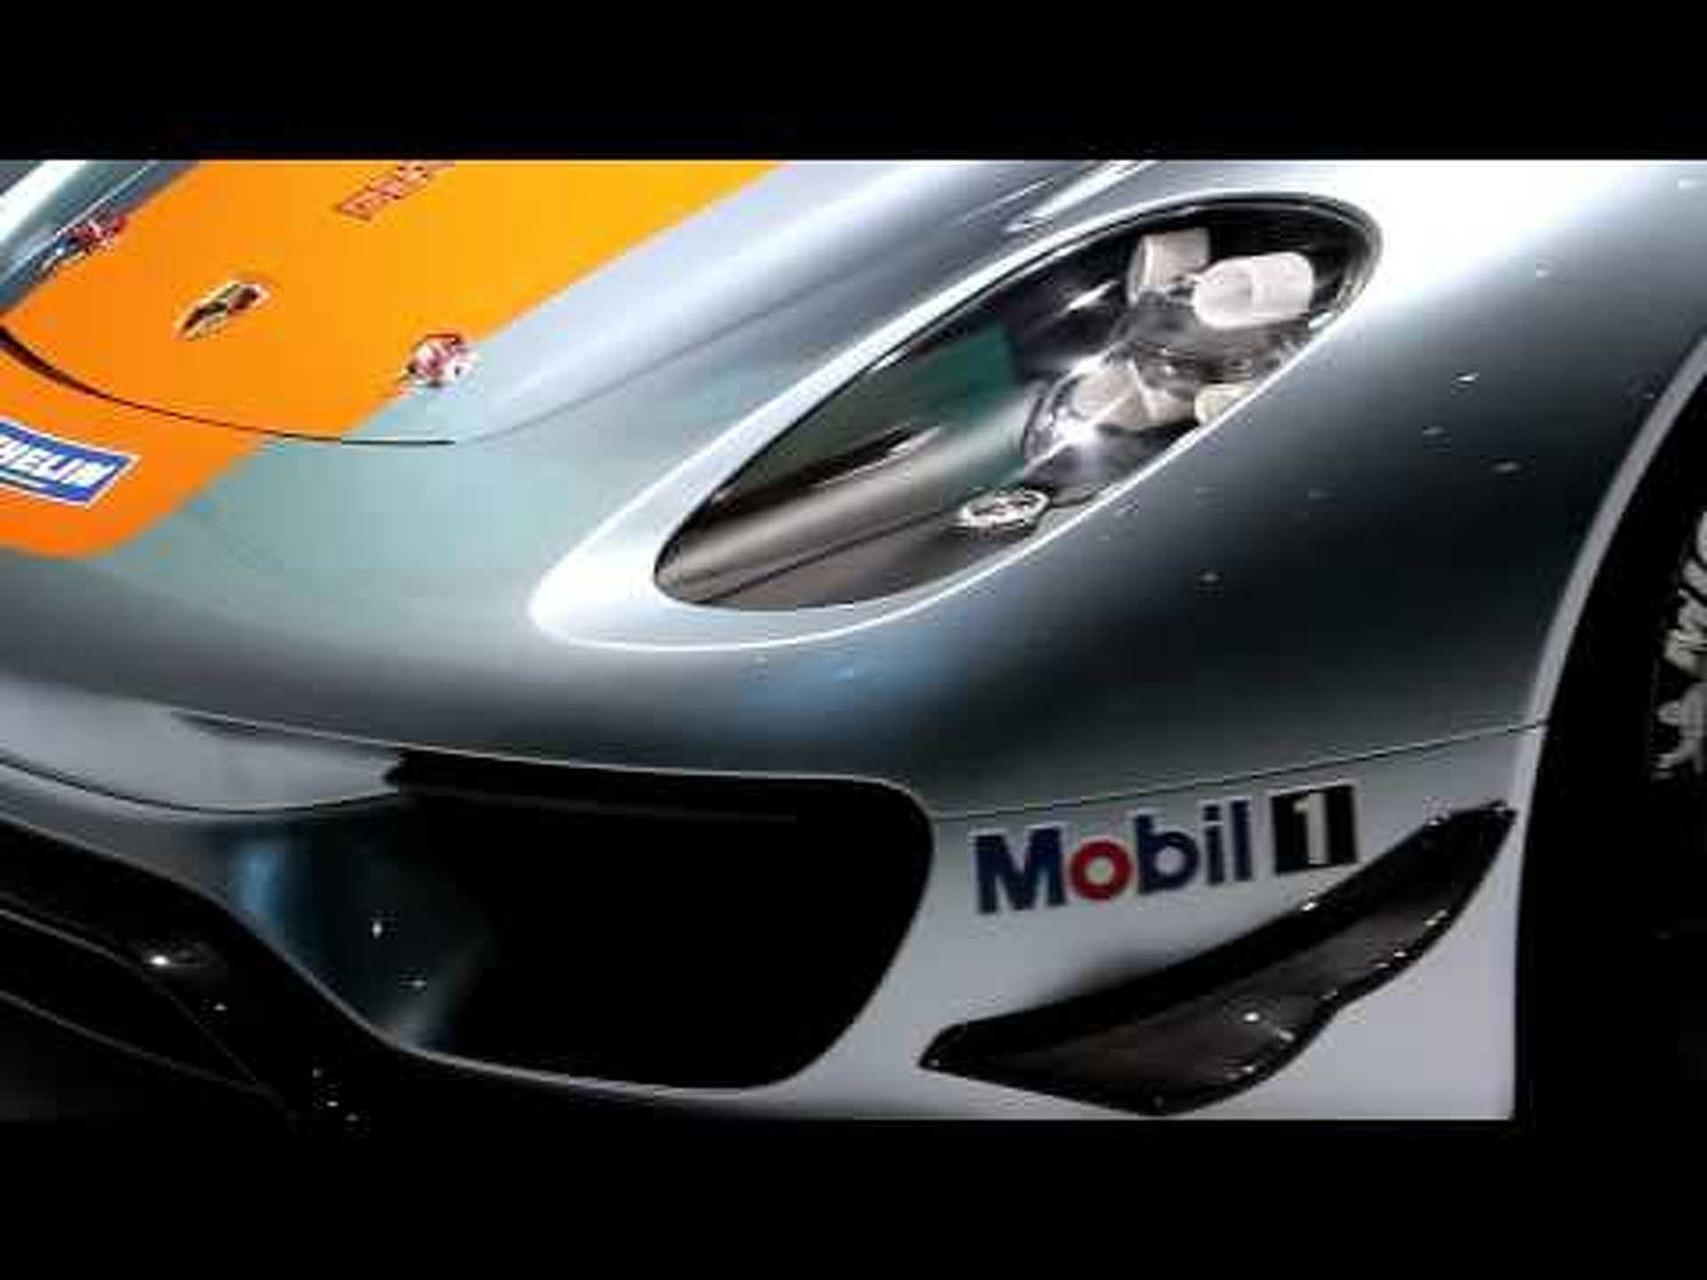 Porsche 918 RSR revealed at the Detroit AutoShow - Wins Best in Show